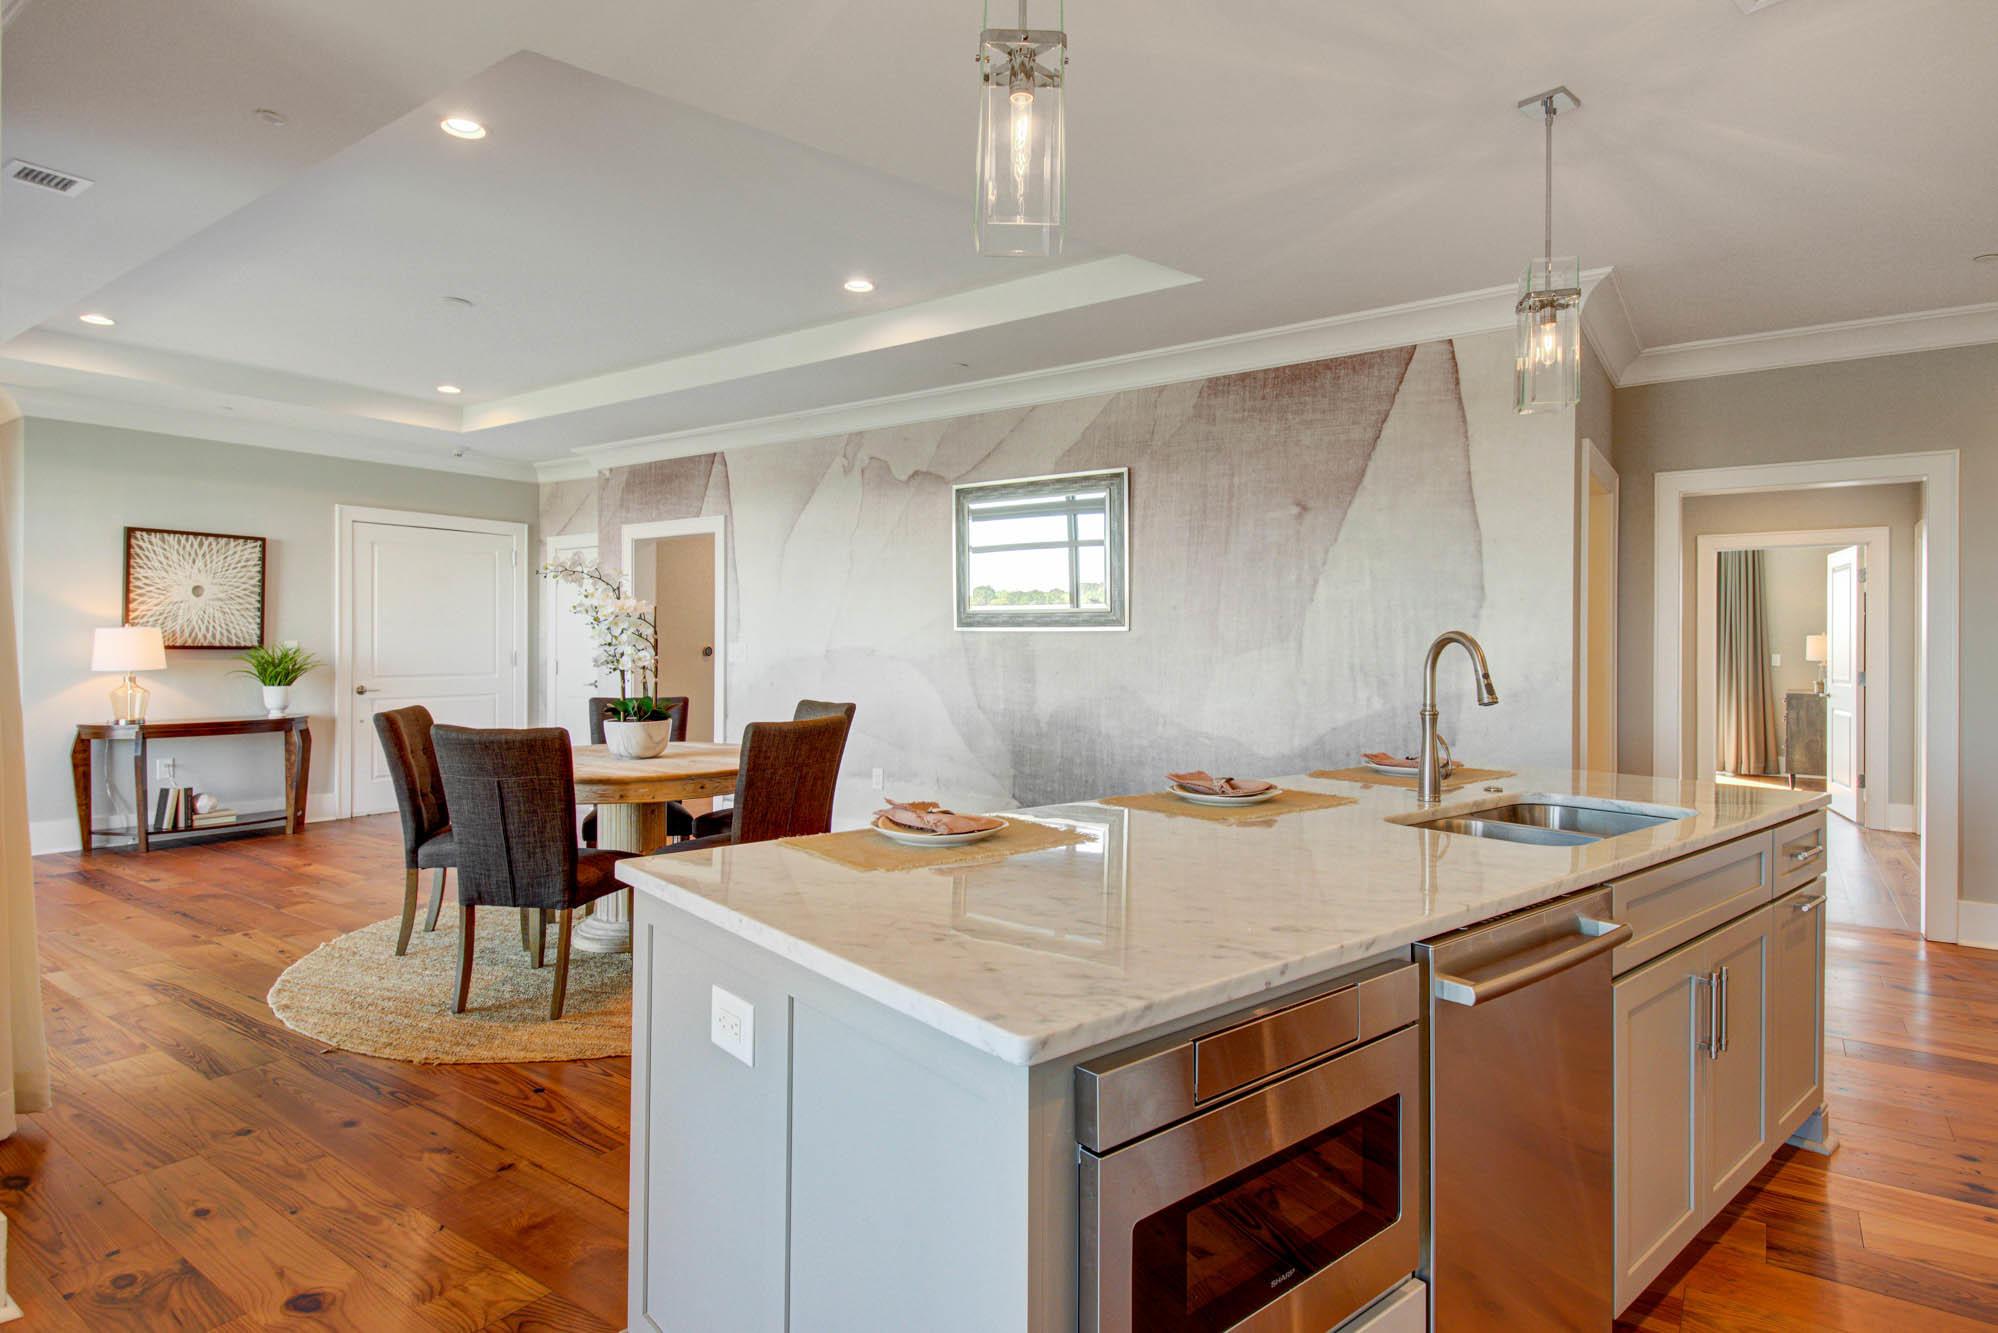 Tides IV Condominiums Homes For Sale - 155 Wingo, Mount Pleasant, SC - 39